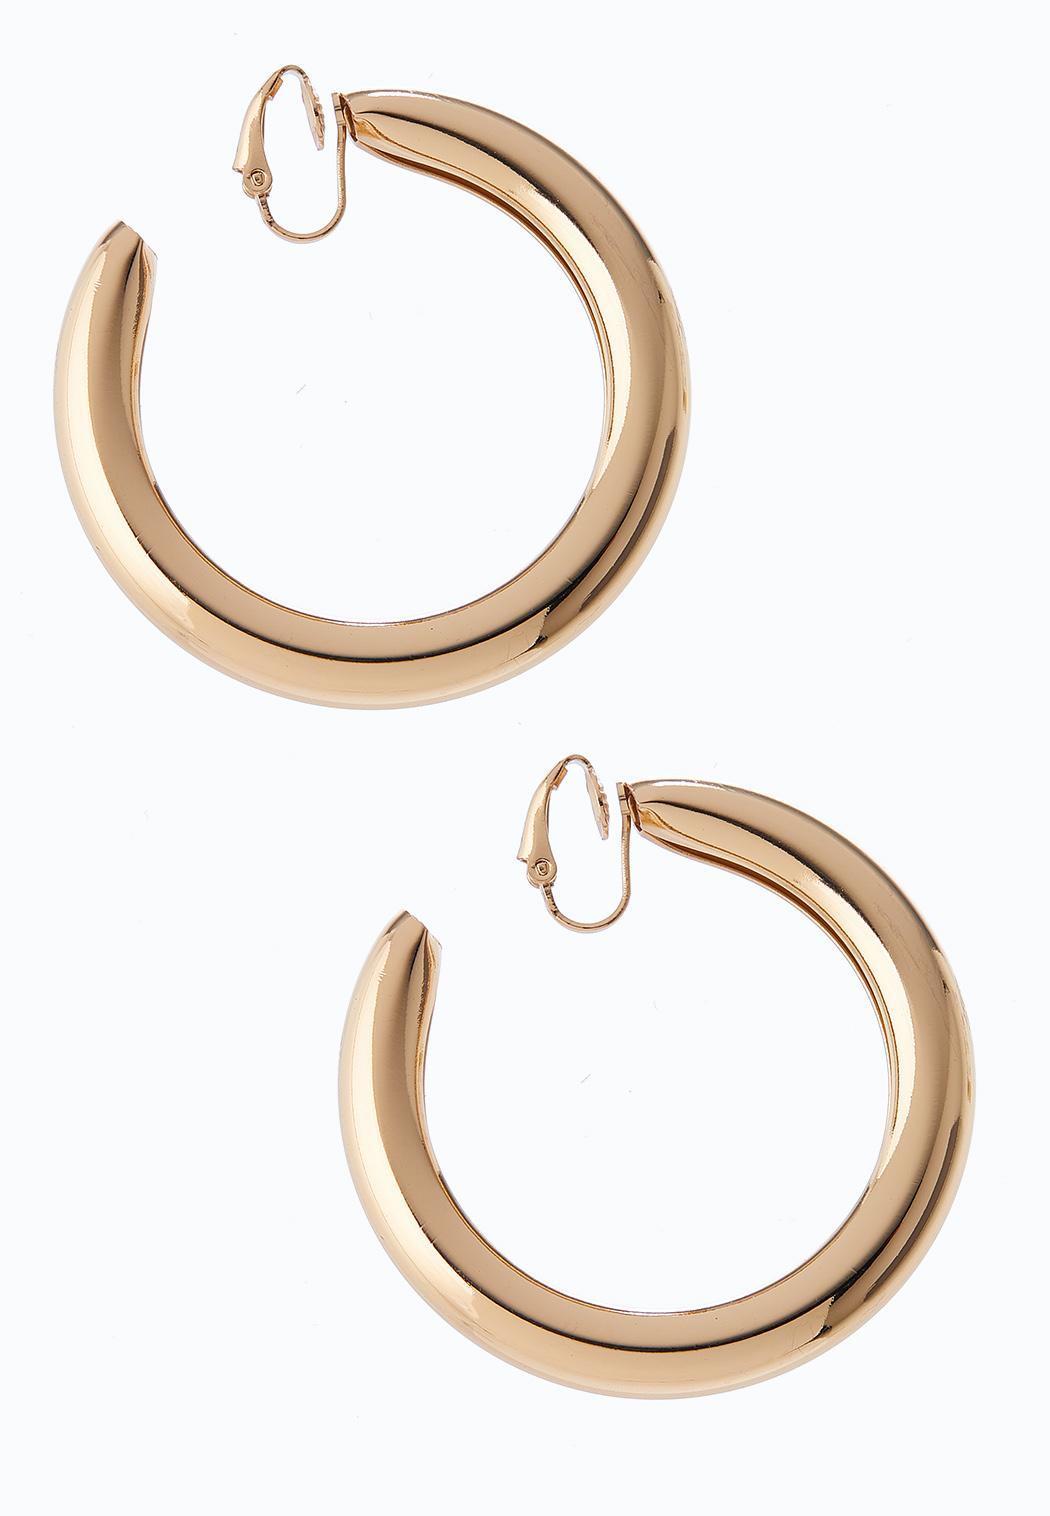 Shiny Gold Hoop Earrings